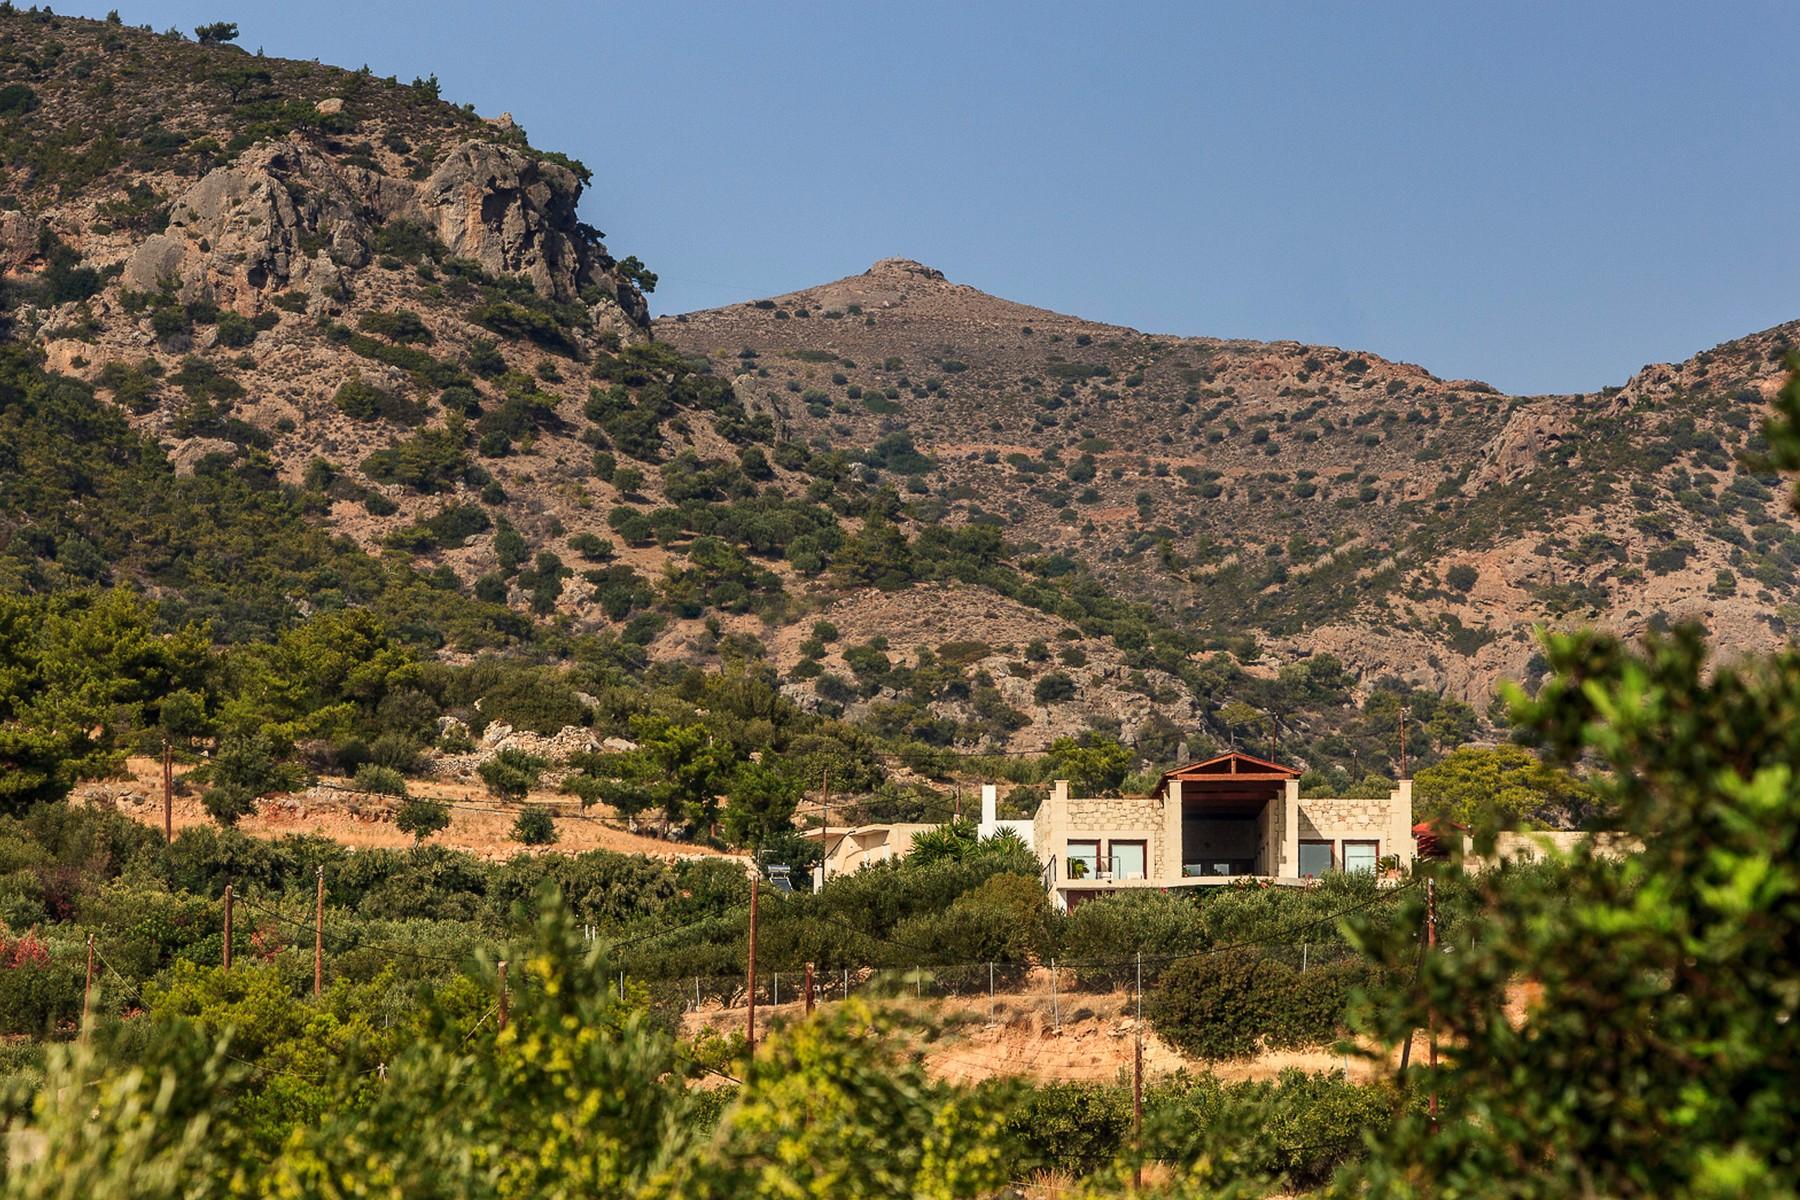 Single Family Home for Sale at Sea View Villa in Lasithi, Crete Makrigialos, Lasithi, Crete Other Greece, Other Areas In Greece, 72055 Greece